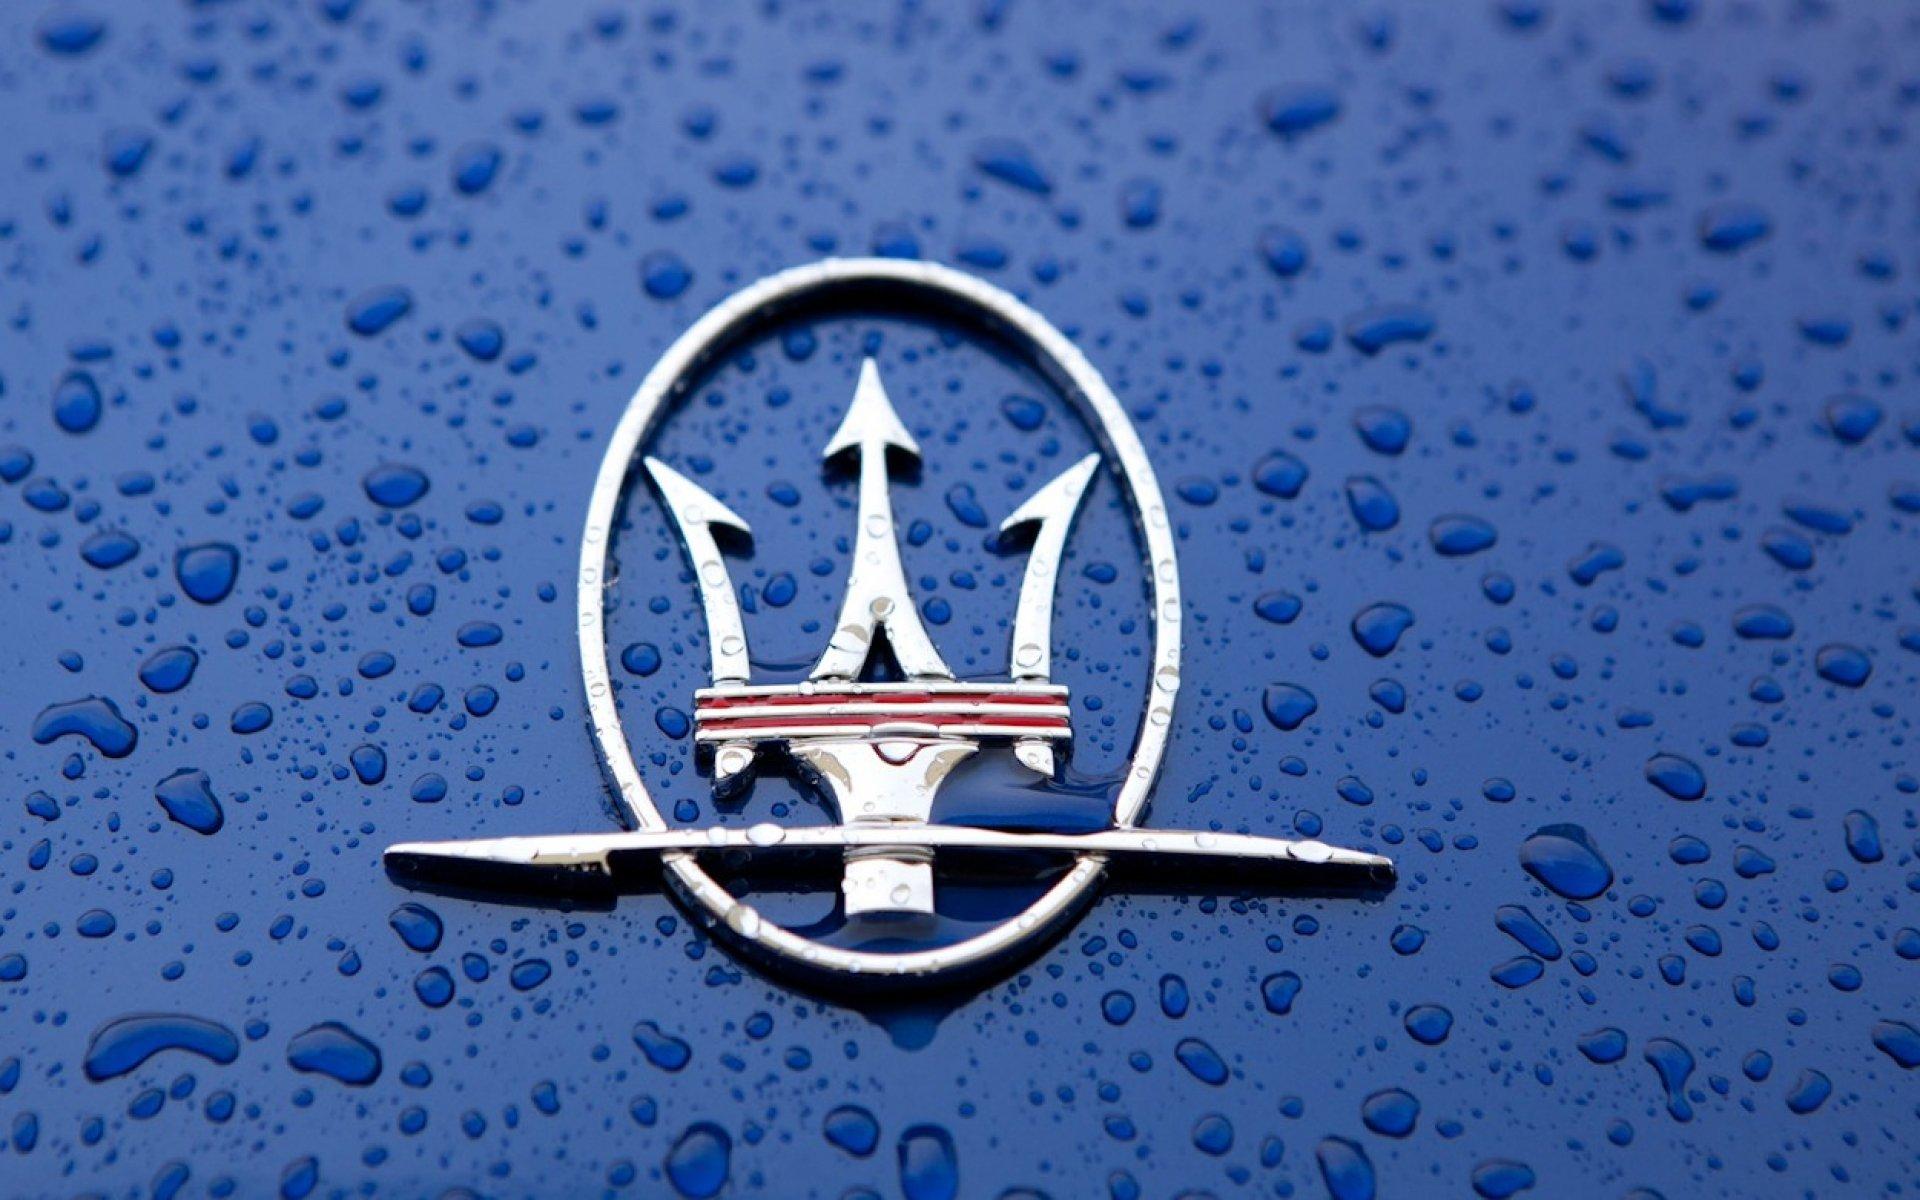 6 hd maserati logo wallpapers - Car logo wallpapers ...